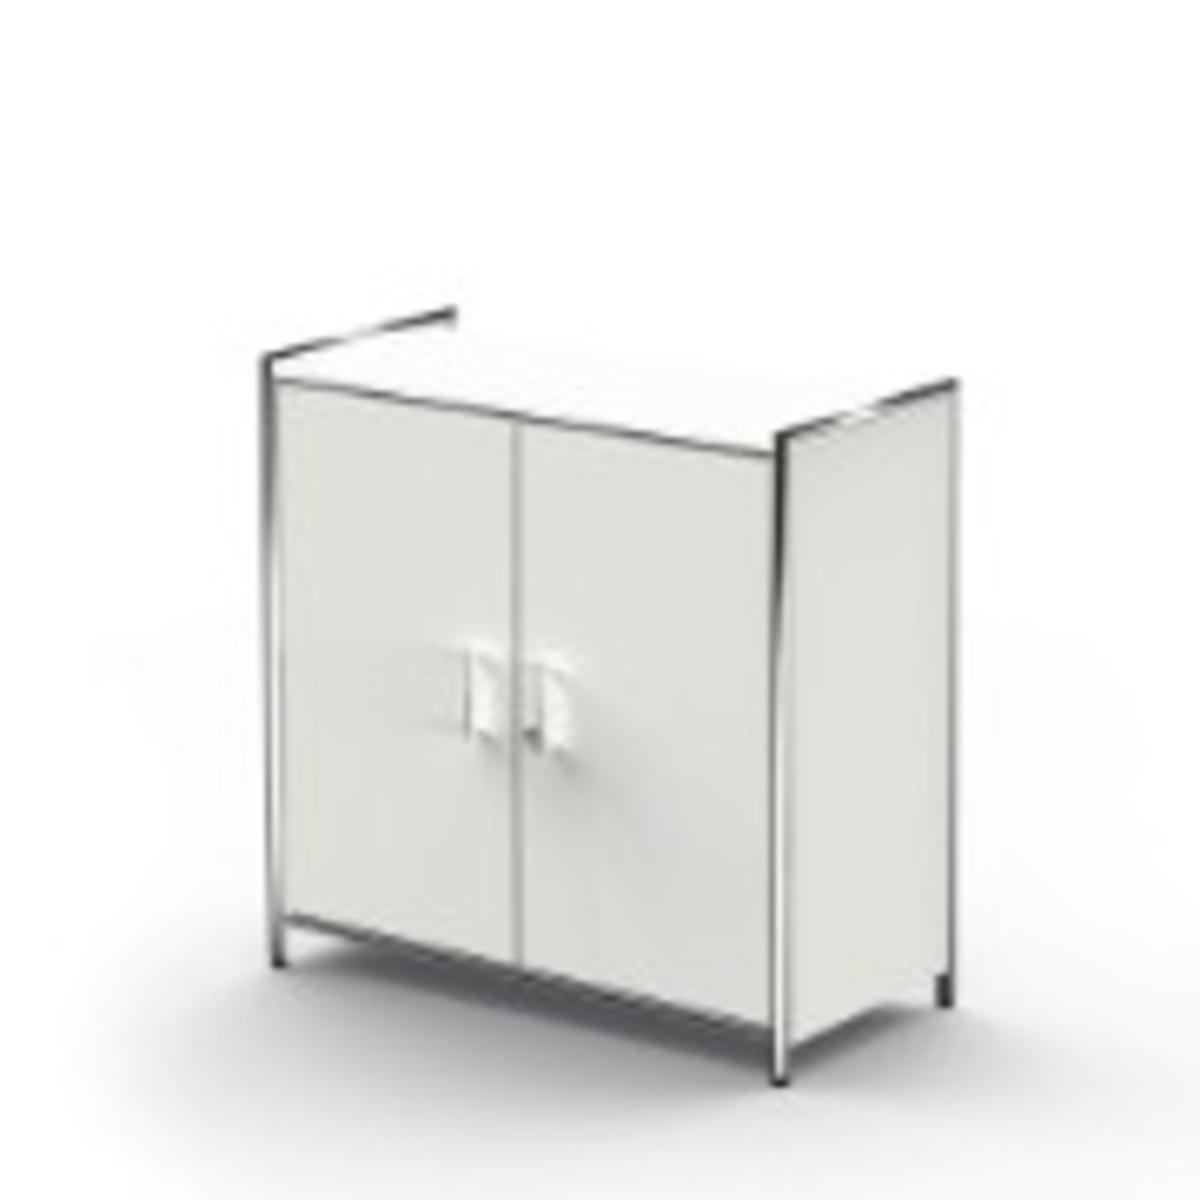 Sideboards - Kranich Büromöbel Vertriebs GmbH